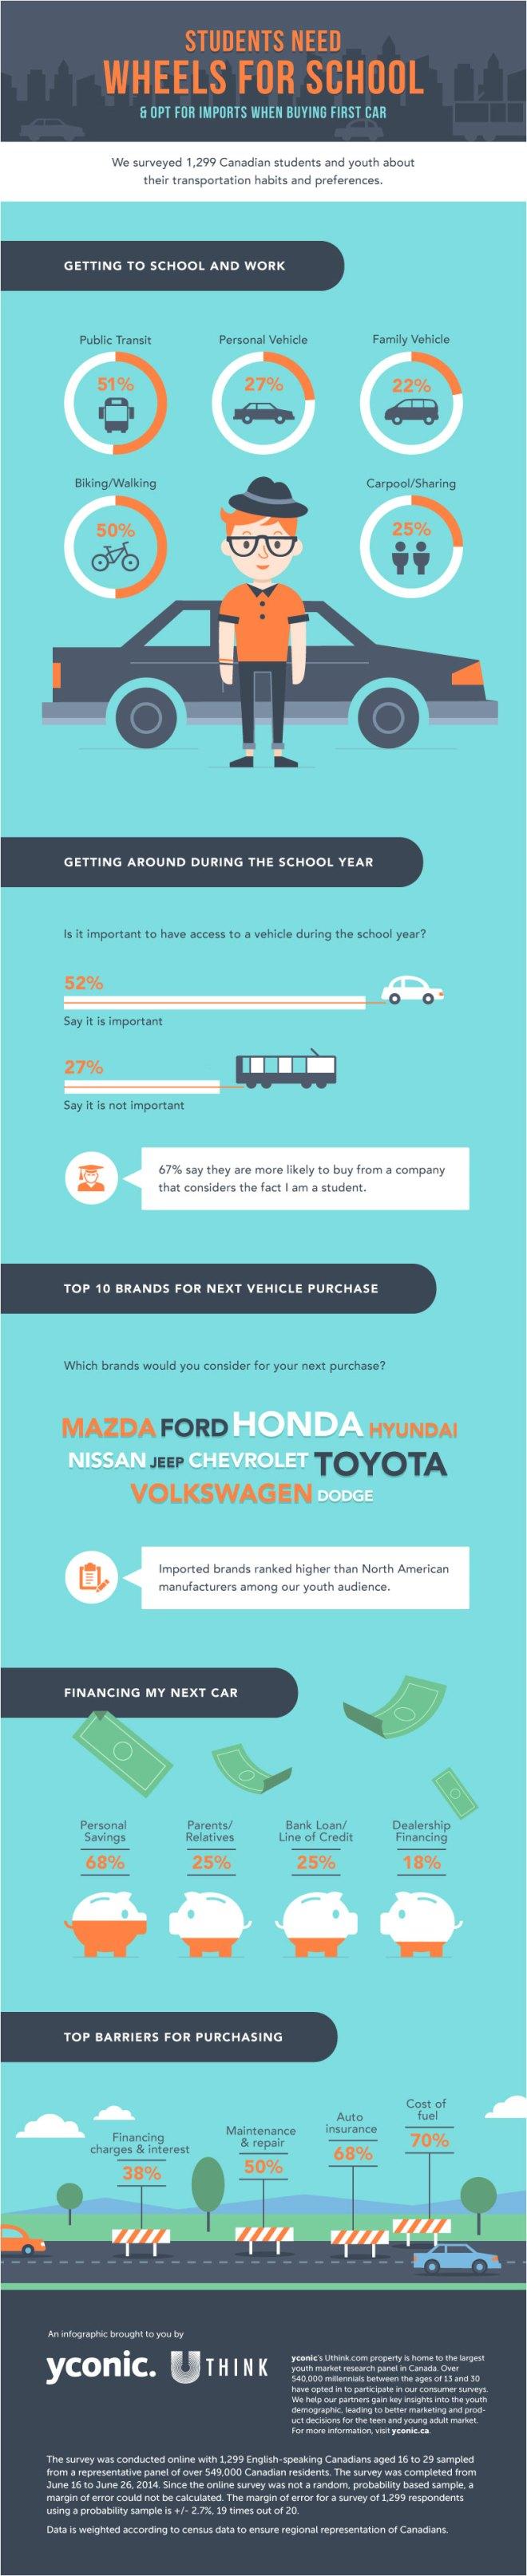 Student_Transport_Auto_Infographic